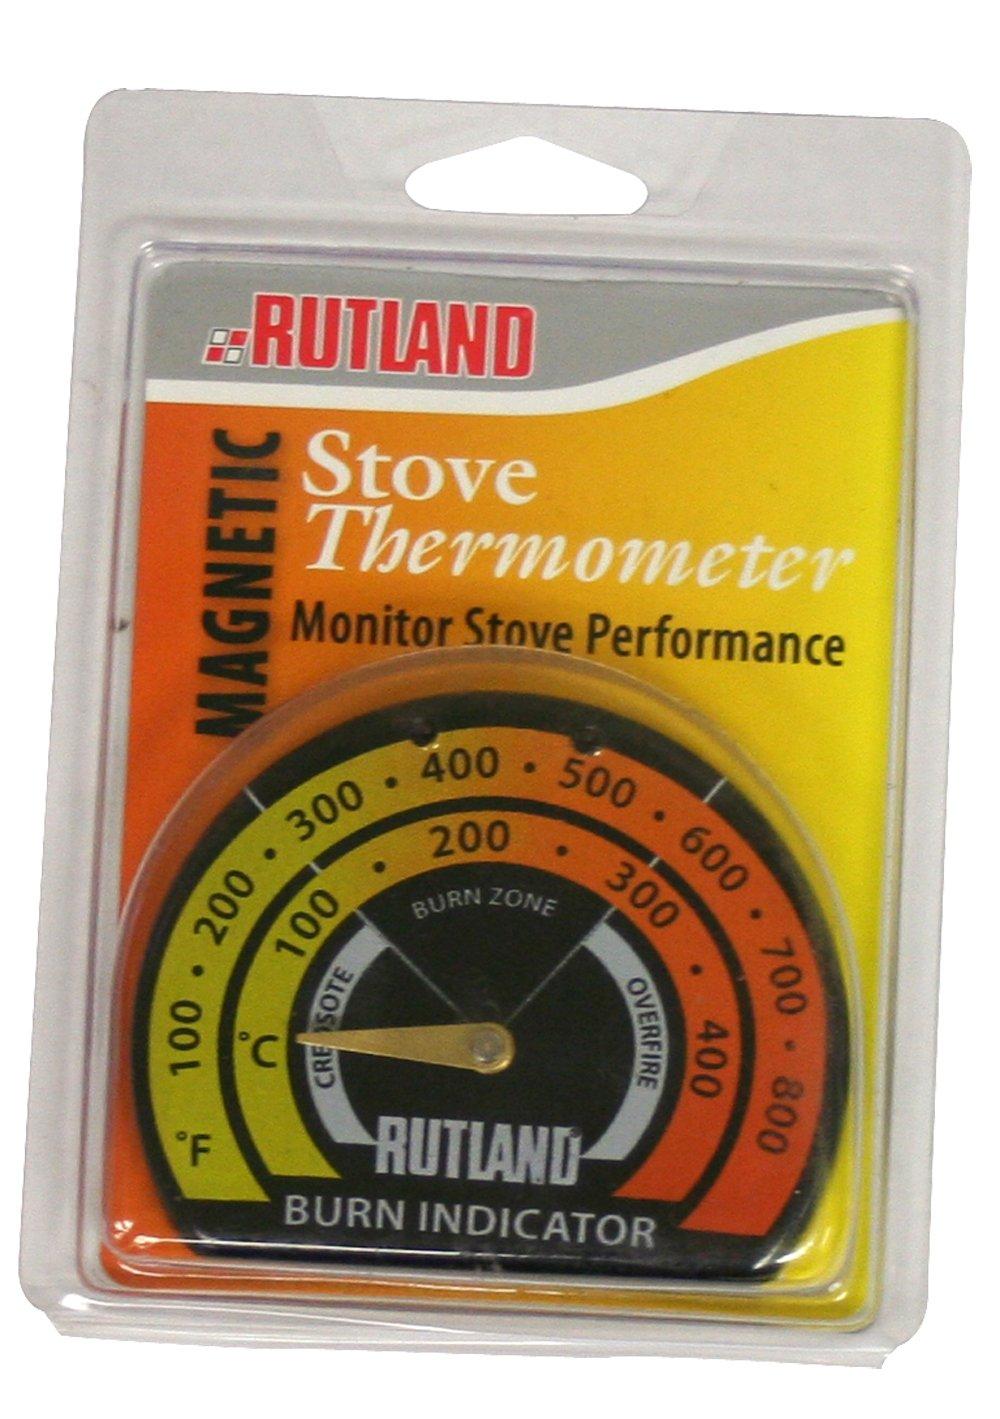 Rutland Products Stove Thermometer/Burn Indicator, Metal, Multi-Colour, 1.59 x 10.79 x 14.92 cm 701